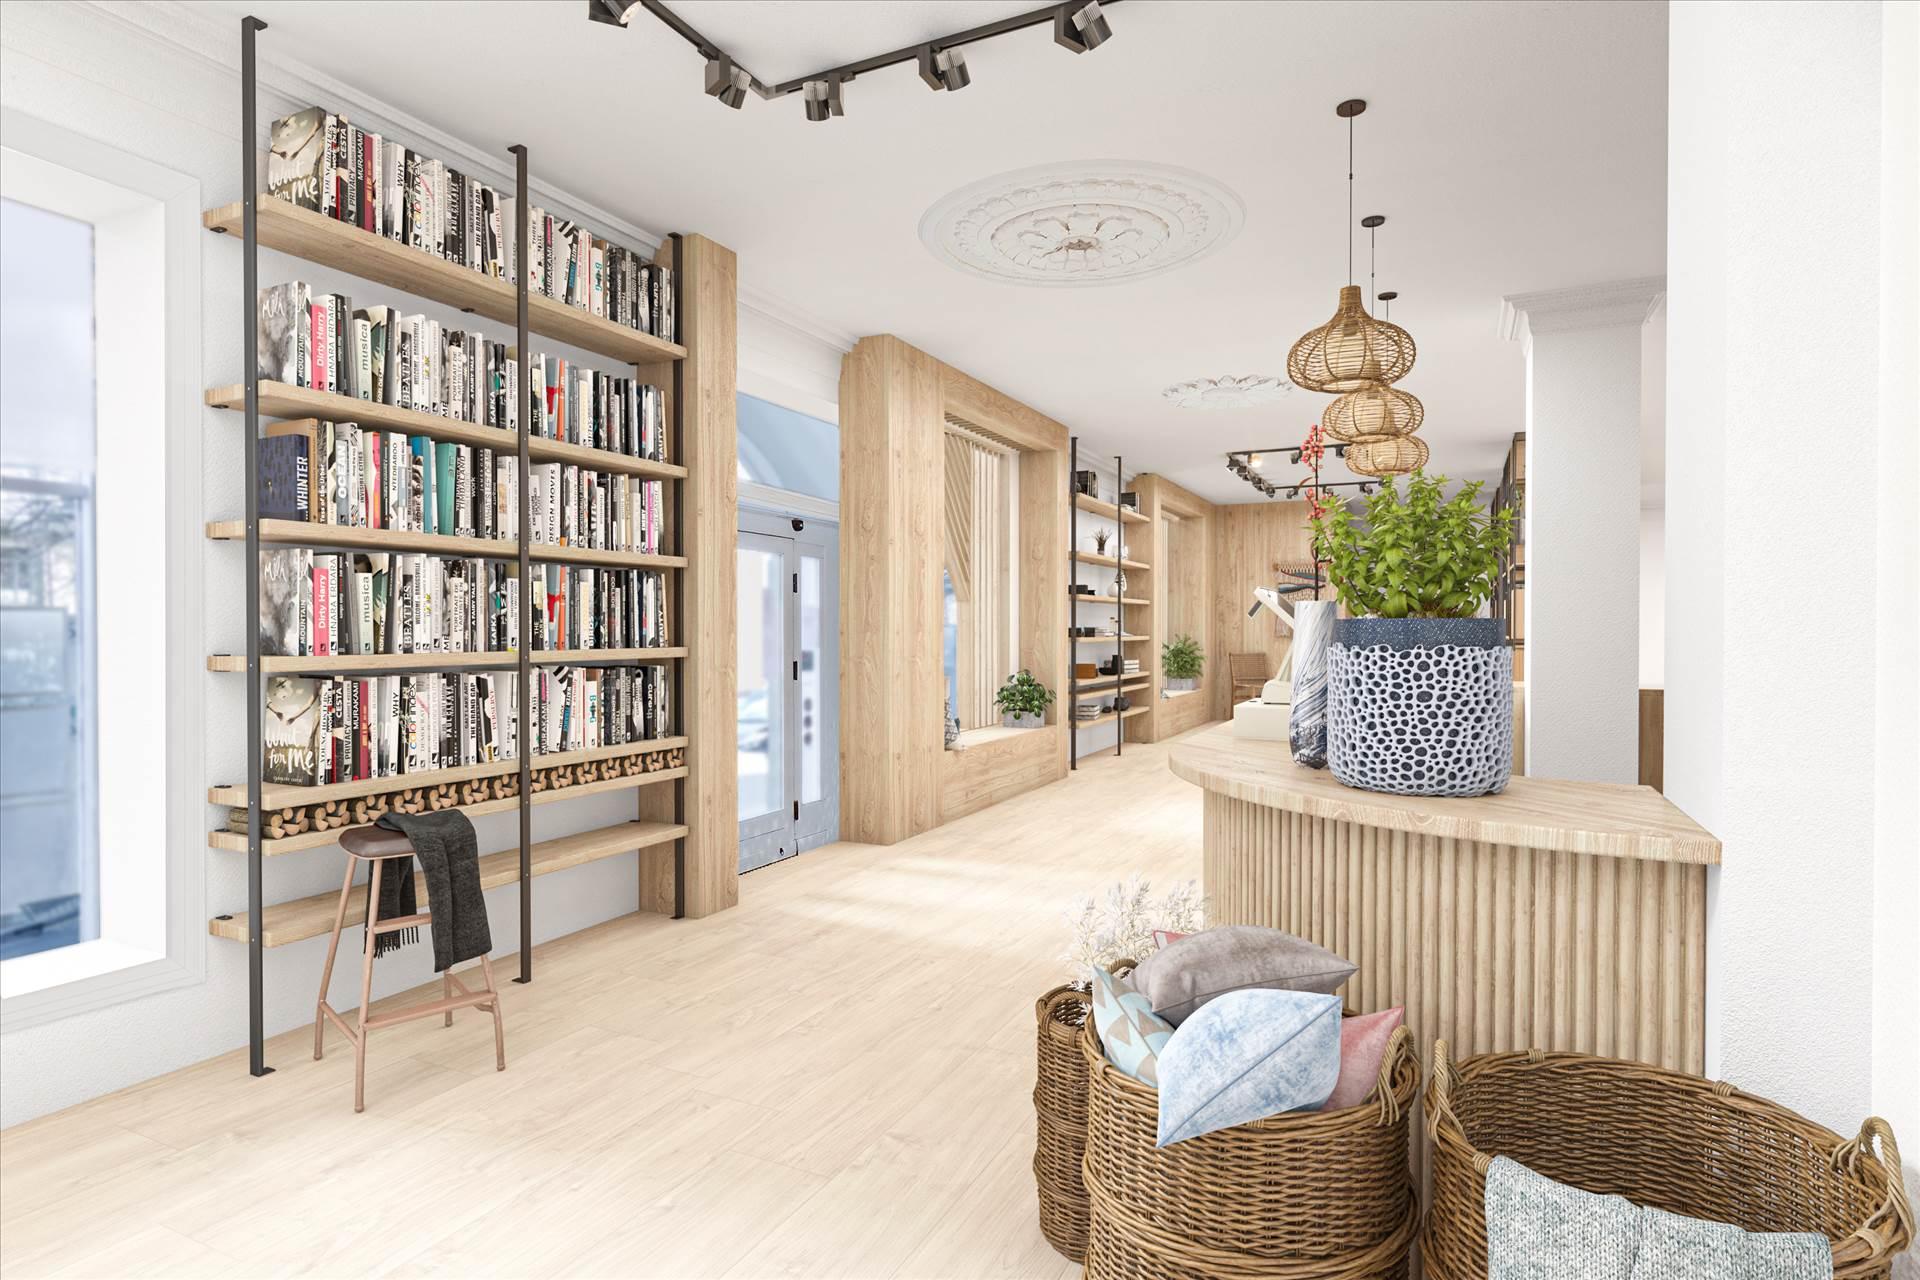 232 m² butik/kontor • Islands Brygge